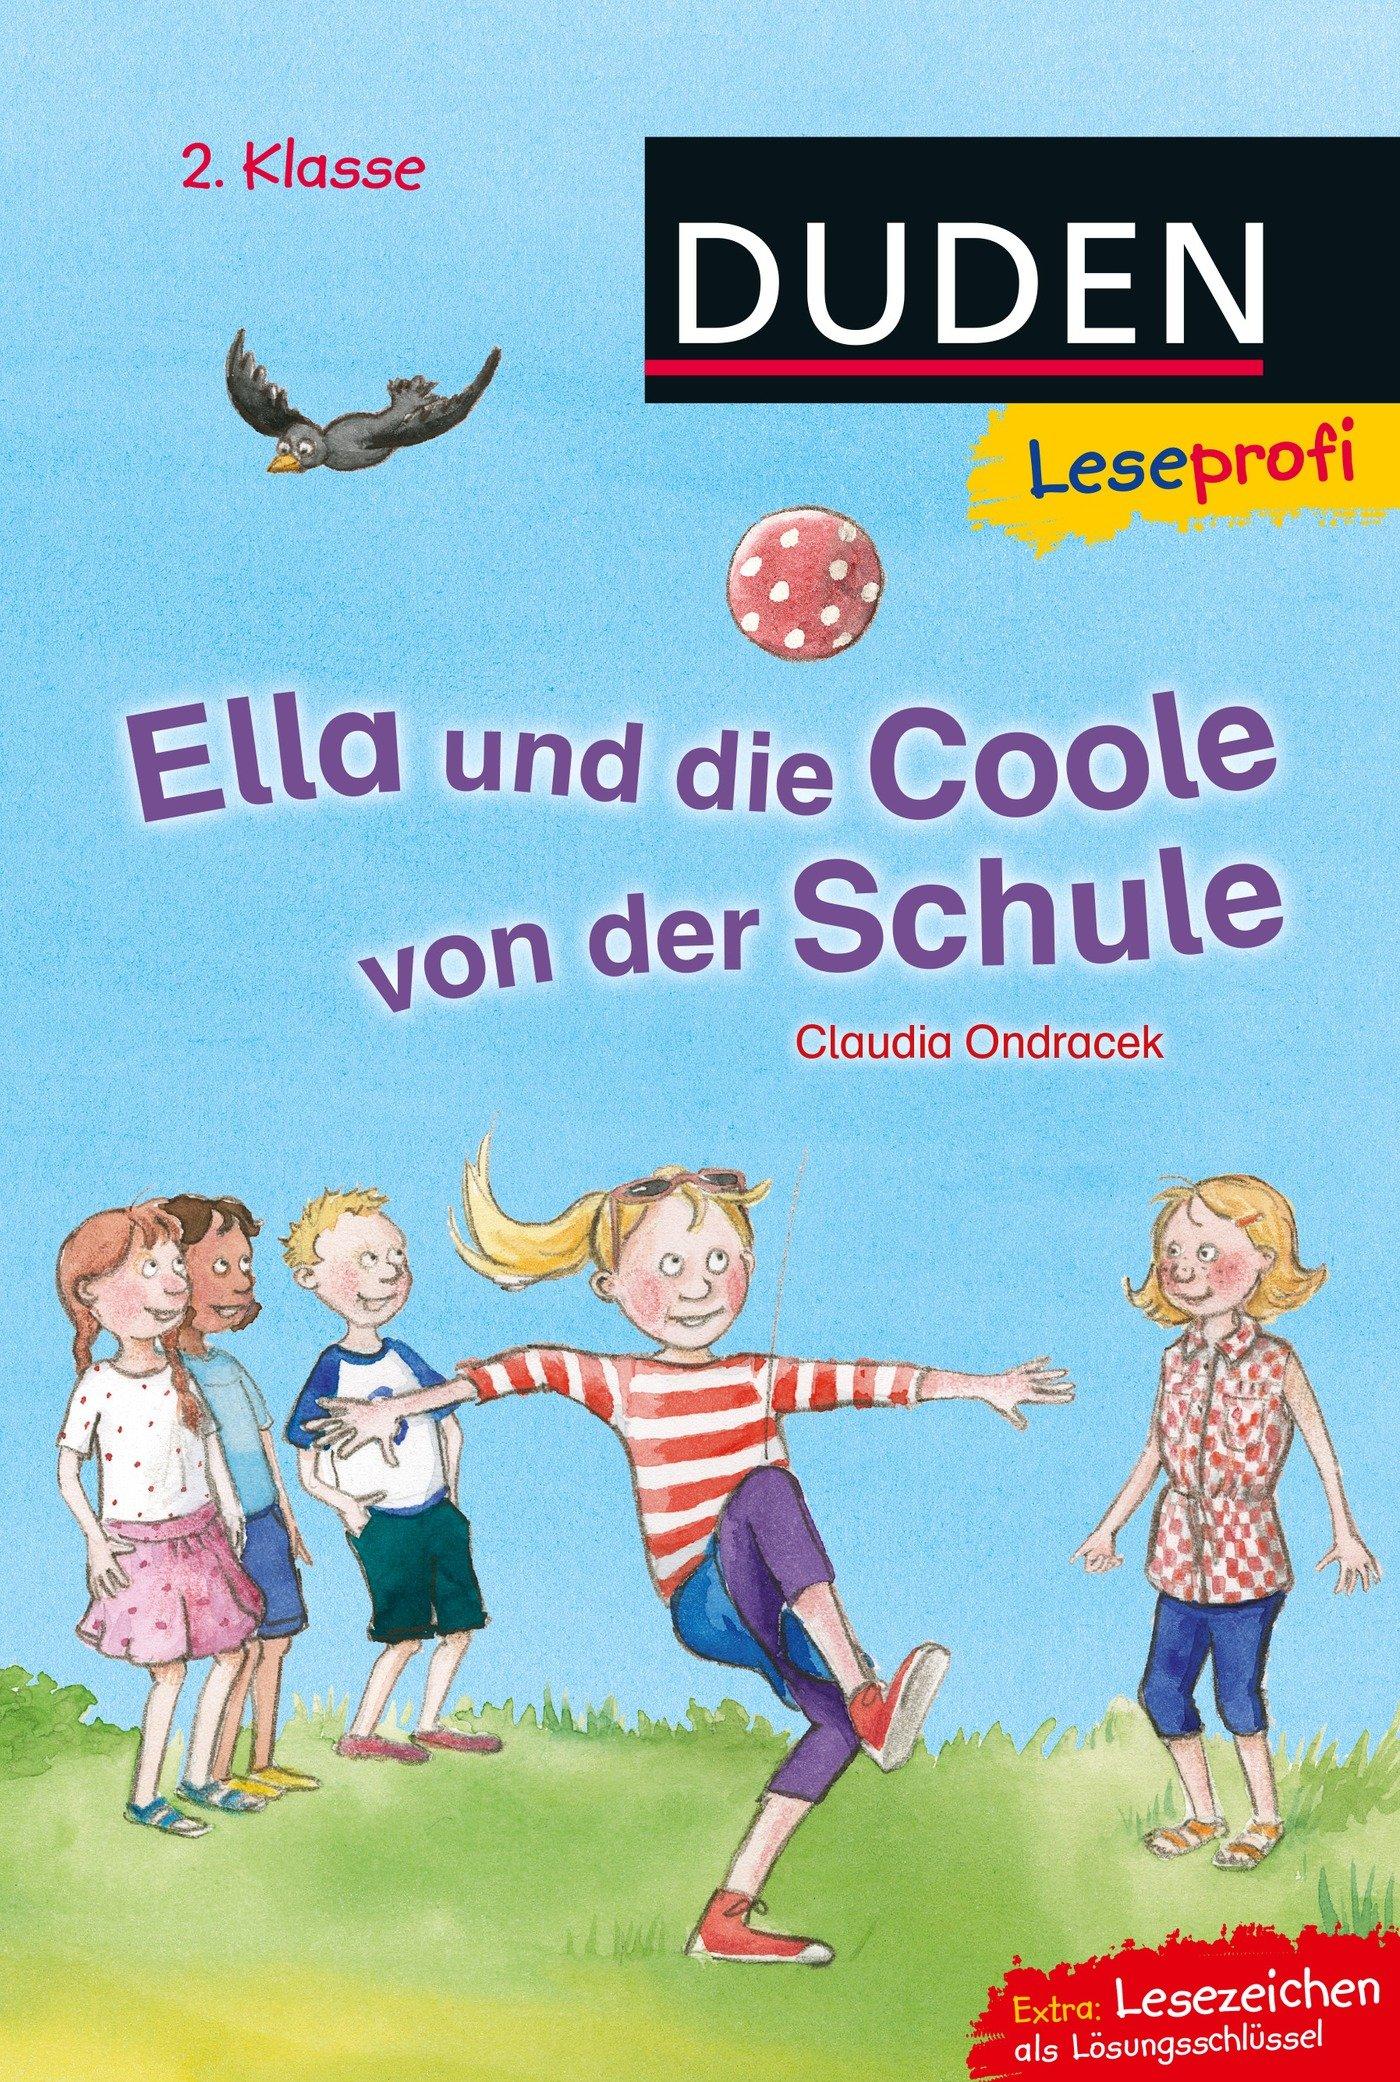 Leseprofi – Ella und die Coole von der Schule, 2. Klasse (DUDEN Leseprofi 2. Klasse)